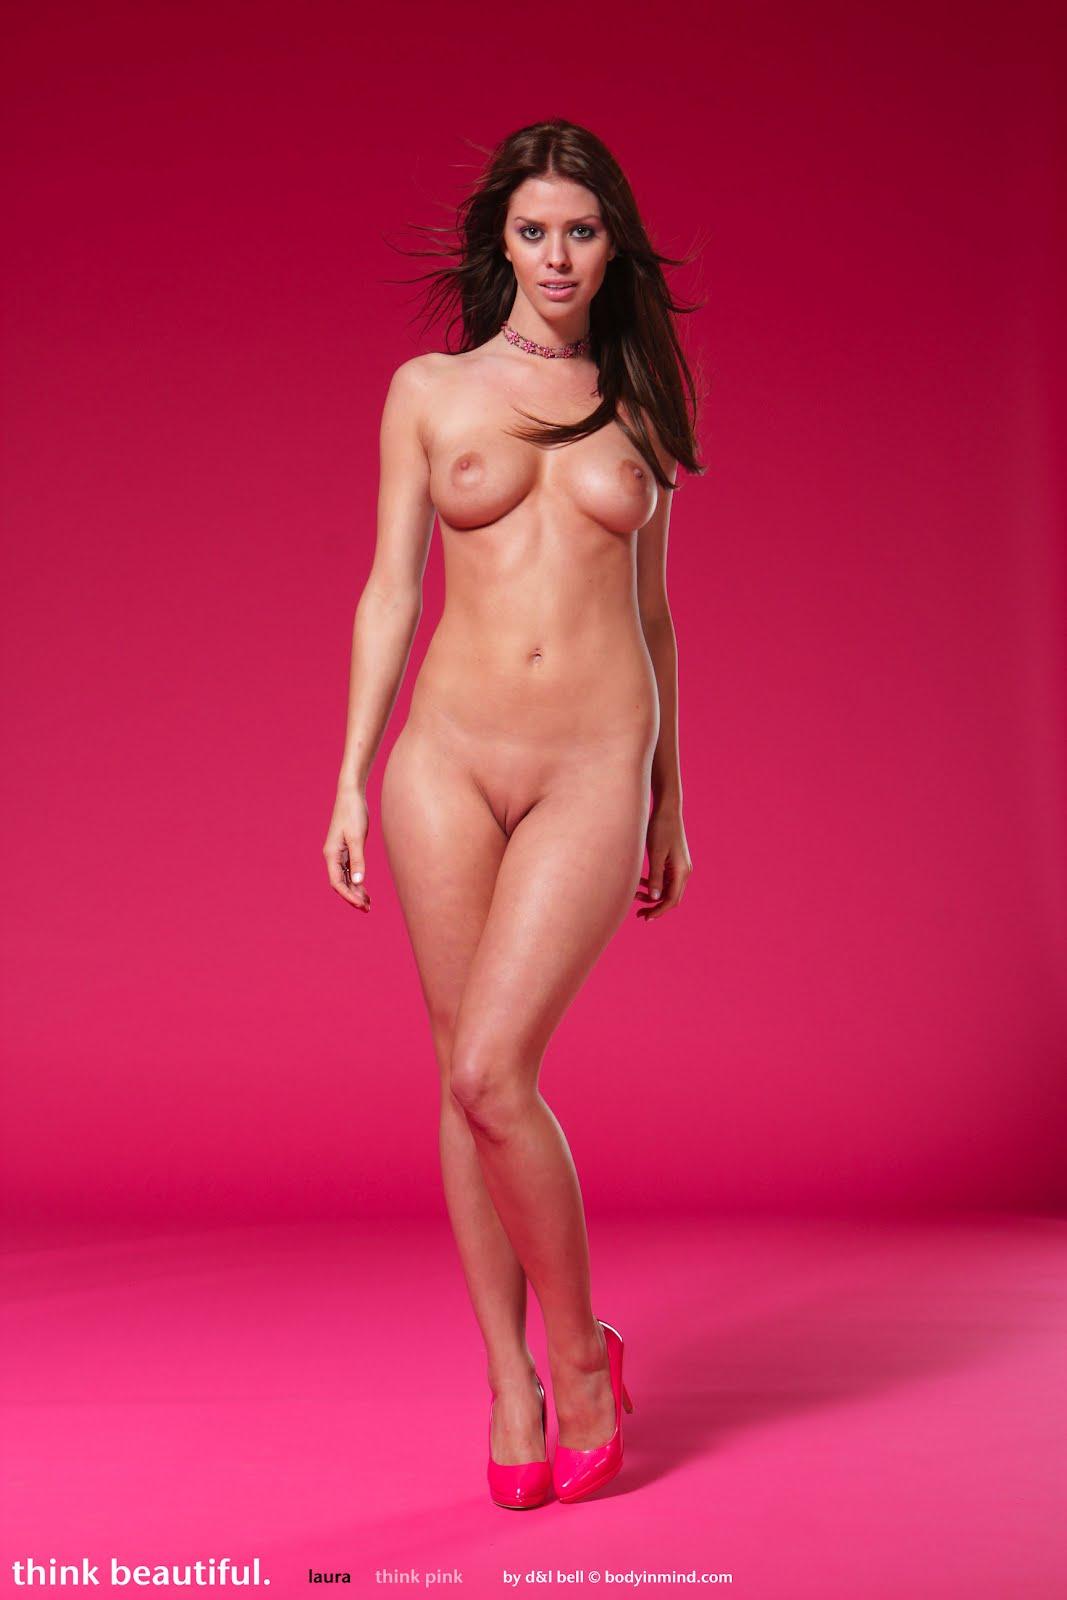 Free full nude of